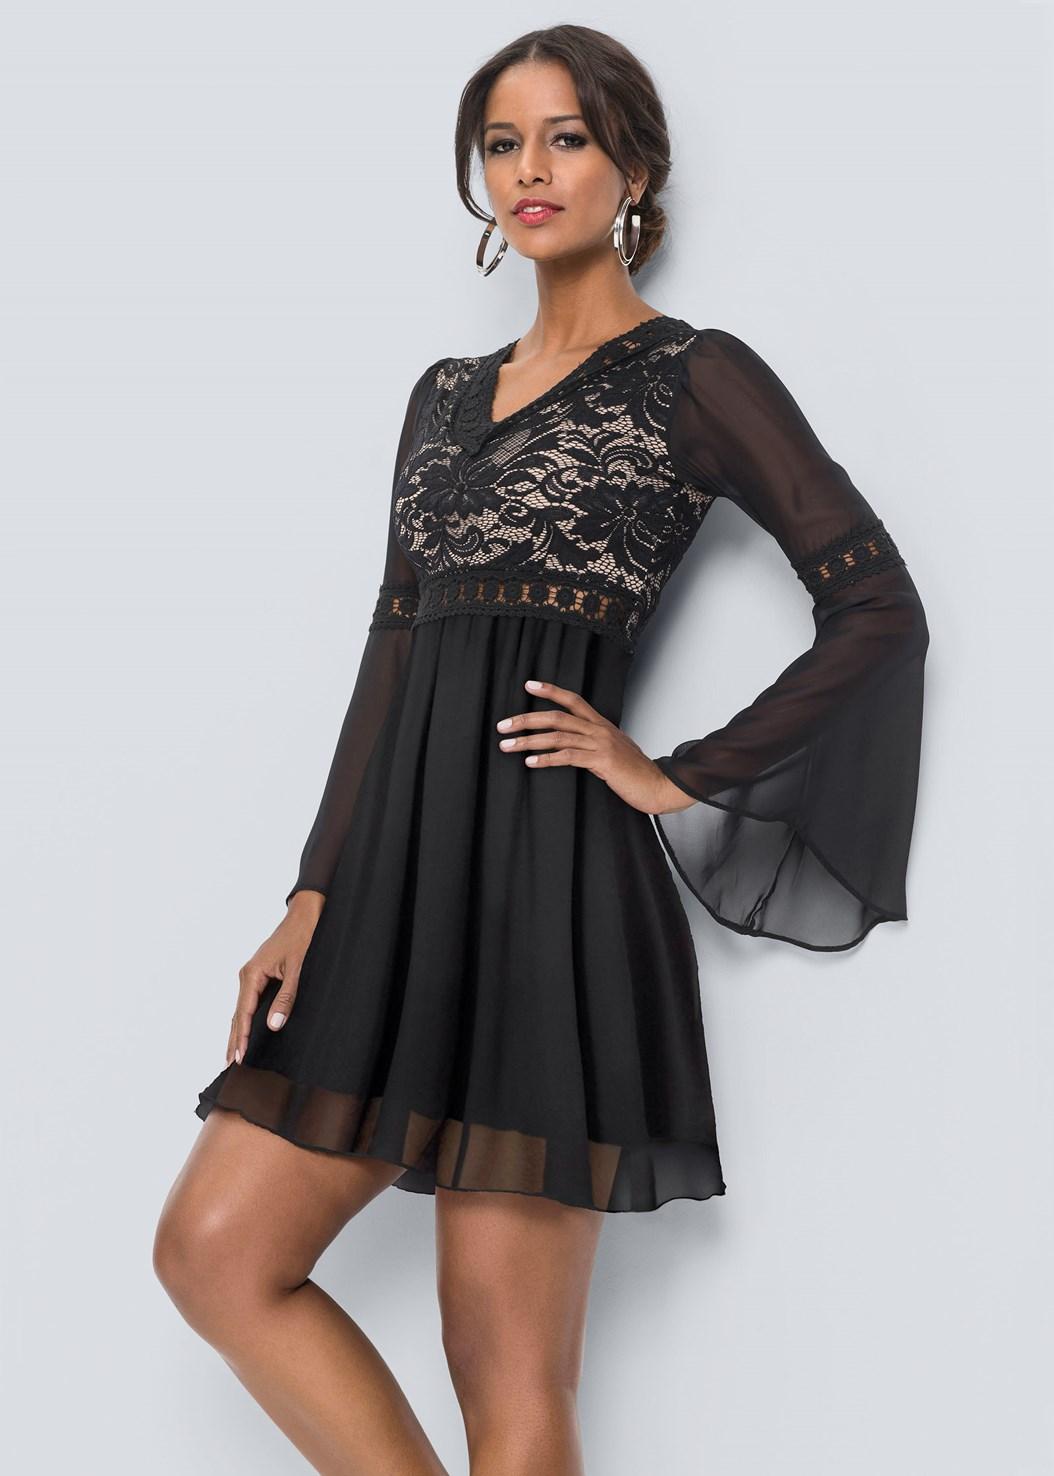 Chiffon Party Dress,Satin Lace Bra/Thong Set,Lucite Detail Heels